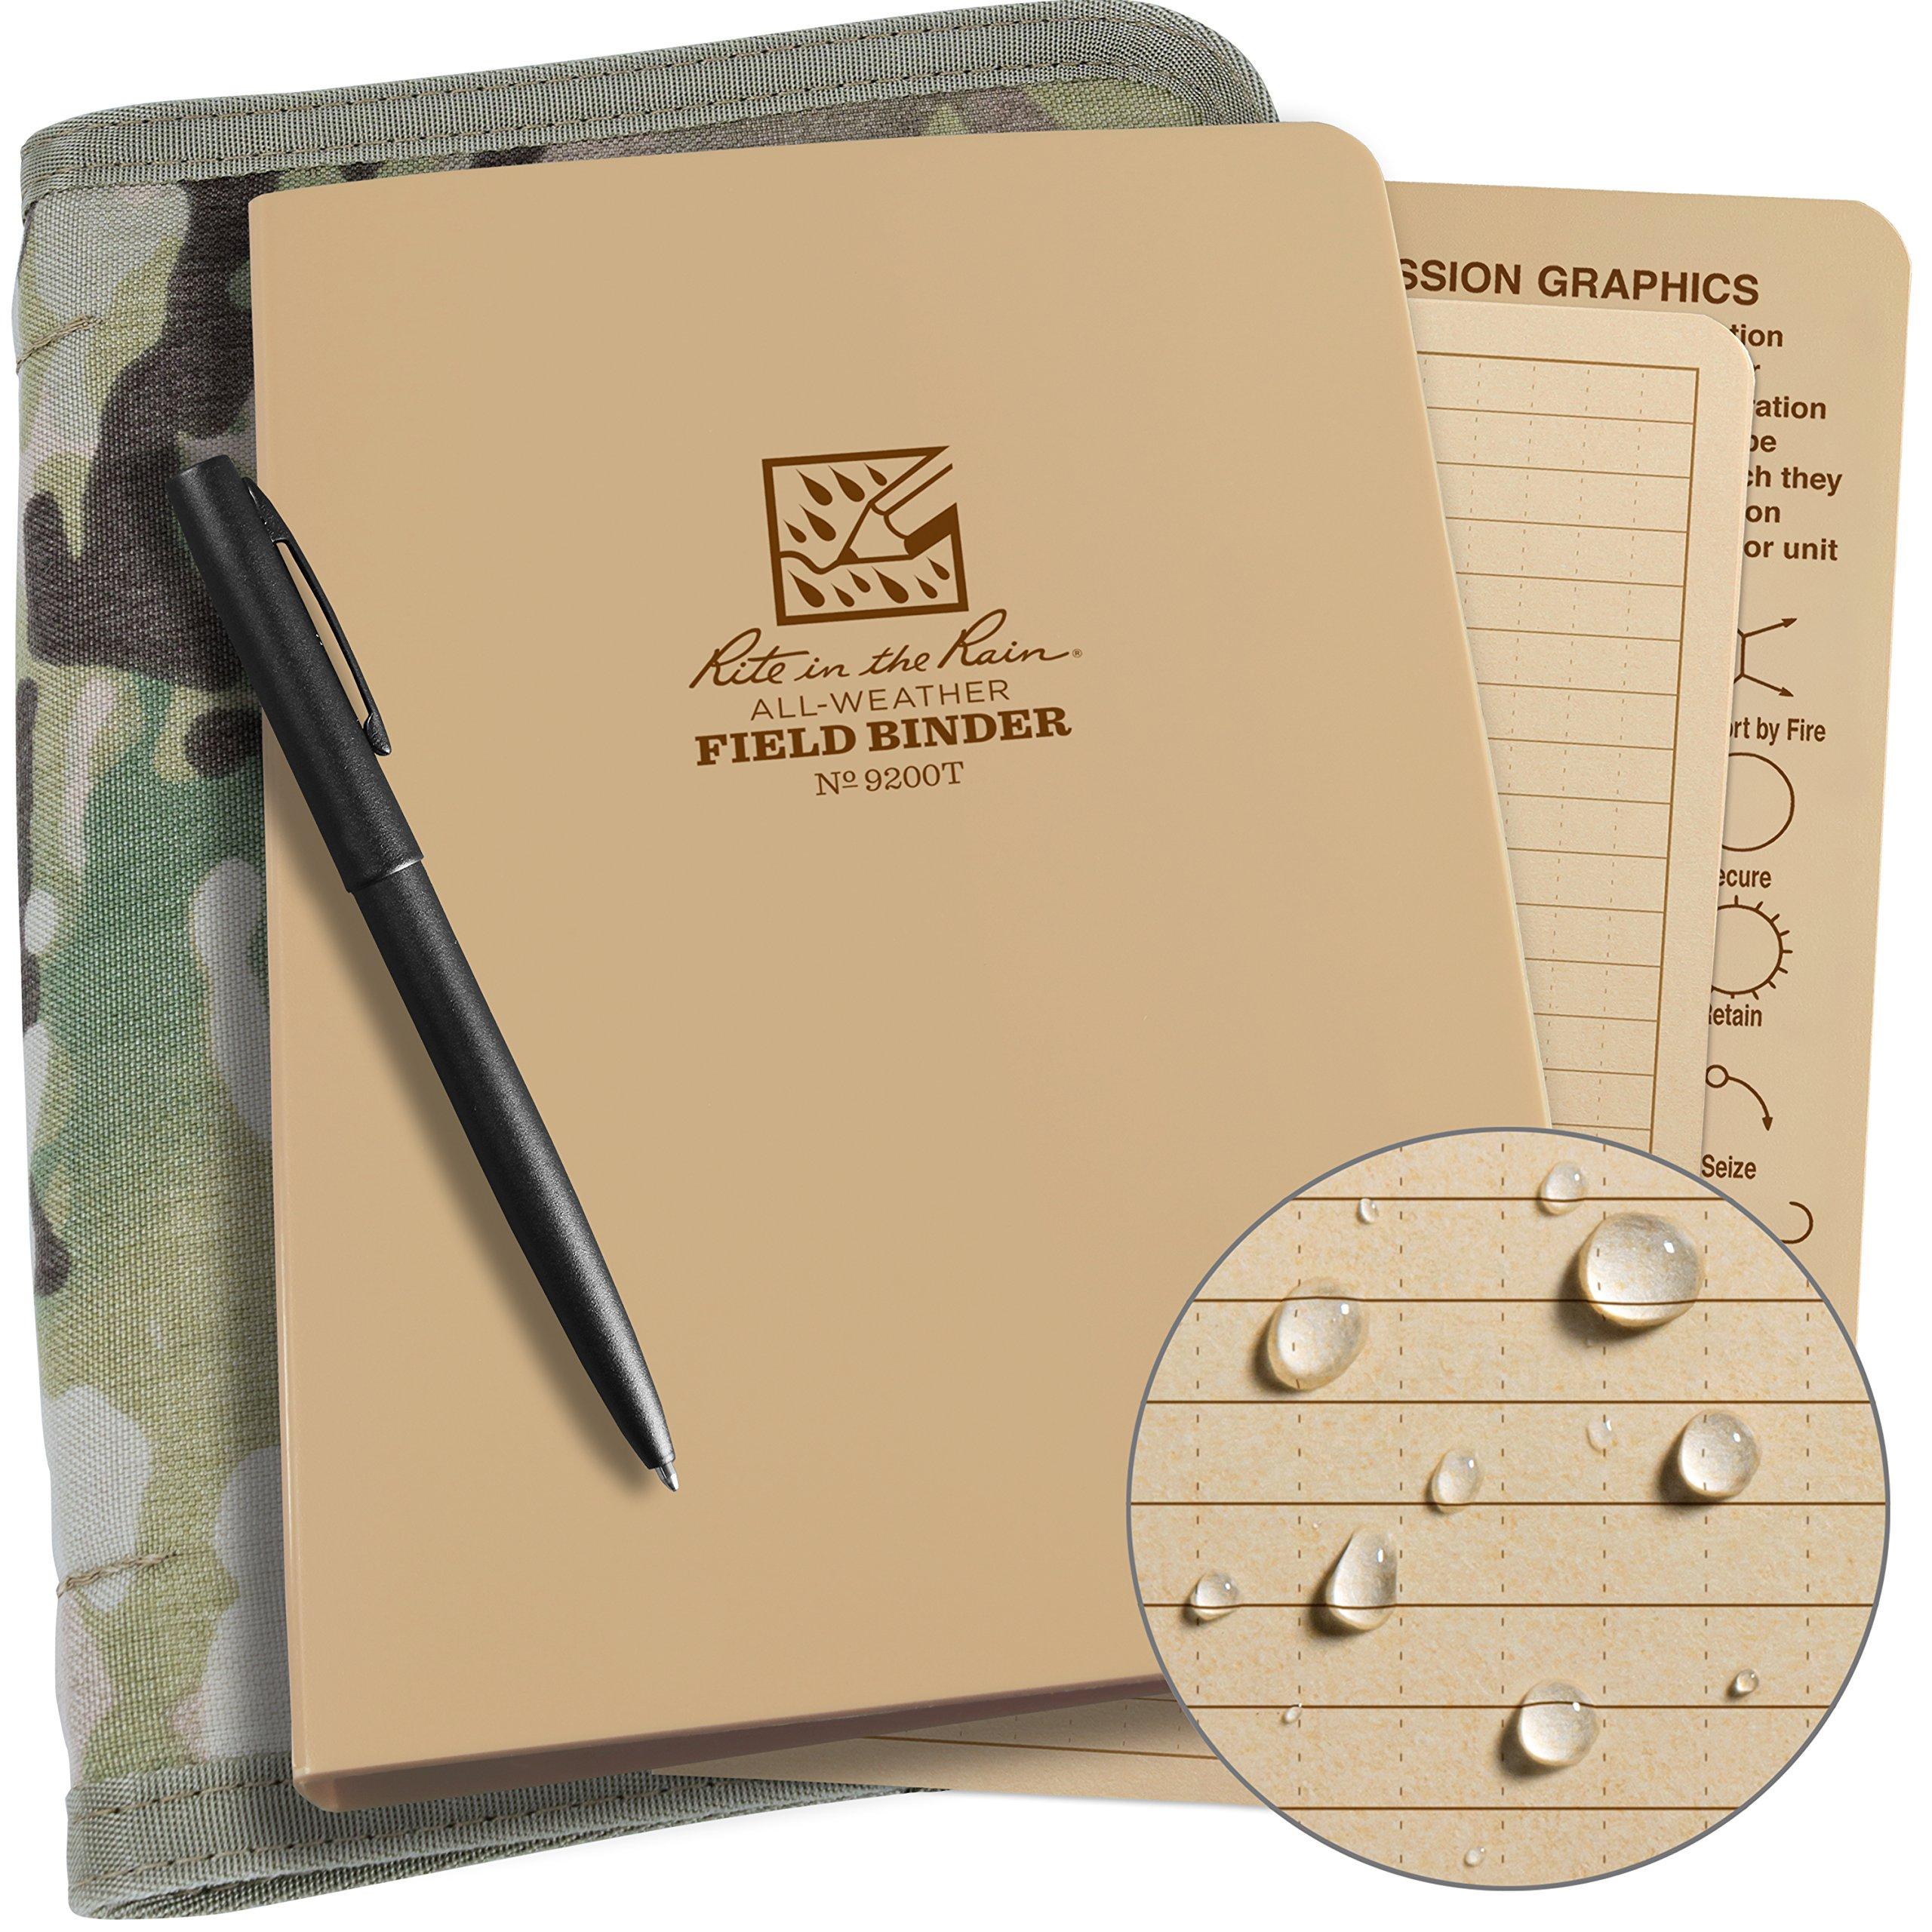 Rite in the Rain Weatherproof Binder Kit: Multicam Cordura Cover, Tan Binder, 50 Sheets Tan Universal Loose Leaf, Weatherproof Pen (No. 9200M-KIT) by Rite In The Rain